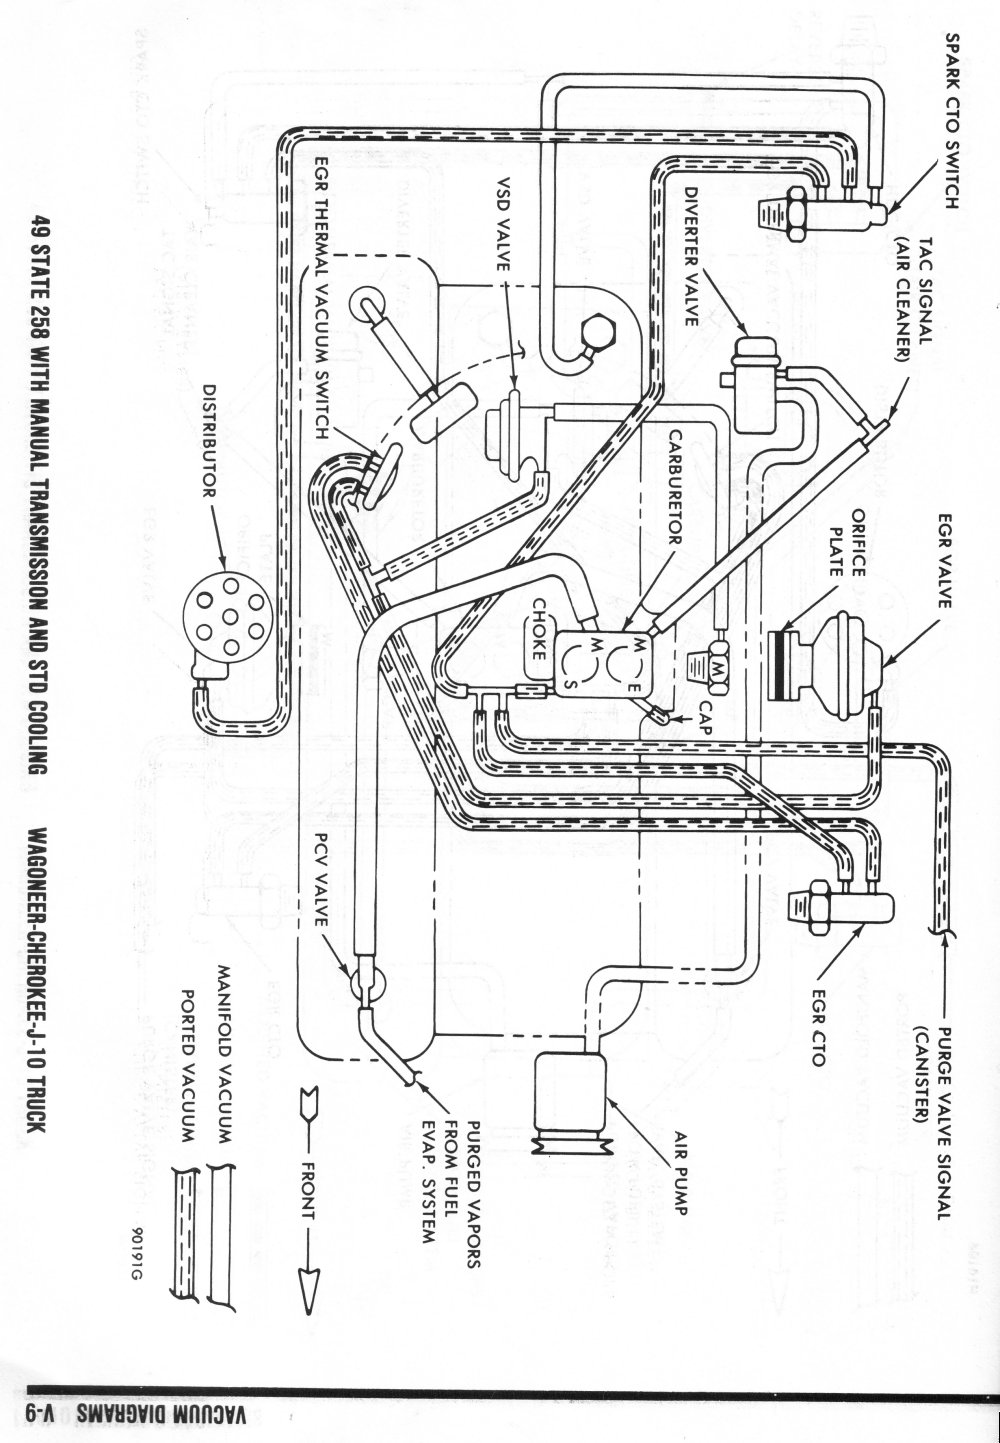 79 cj5 vacuum diagram oljeep  fsj vacuum layout page  oljeep  fsj vacuum layout page